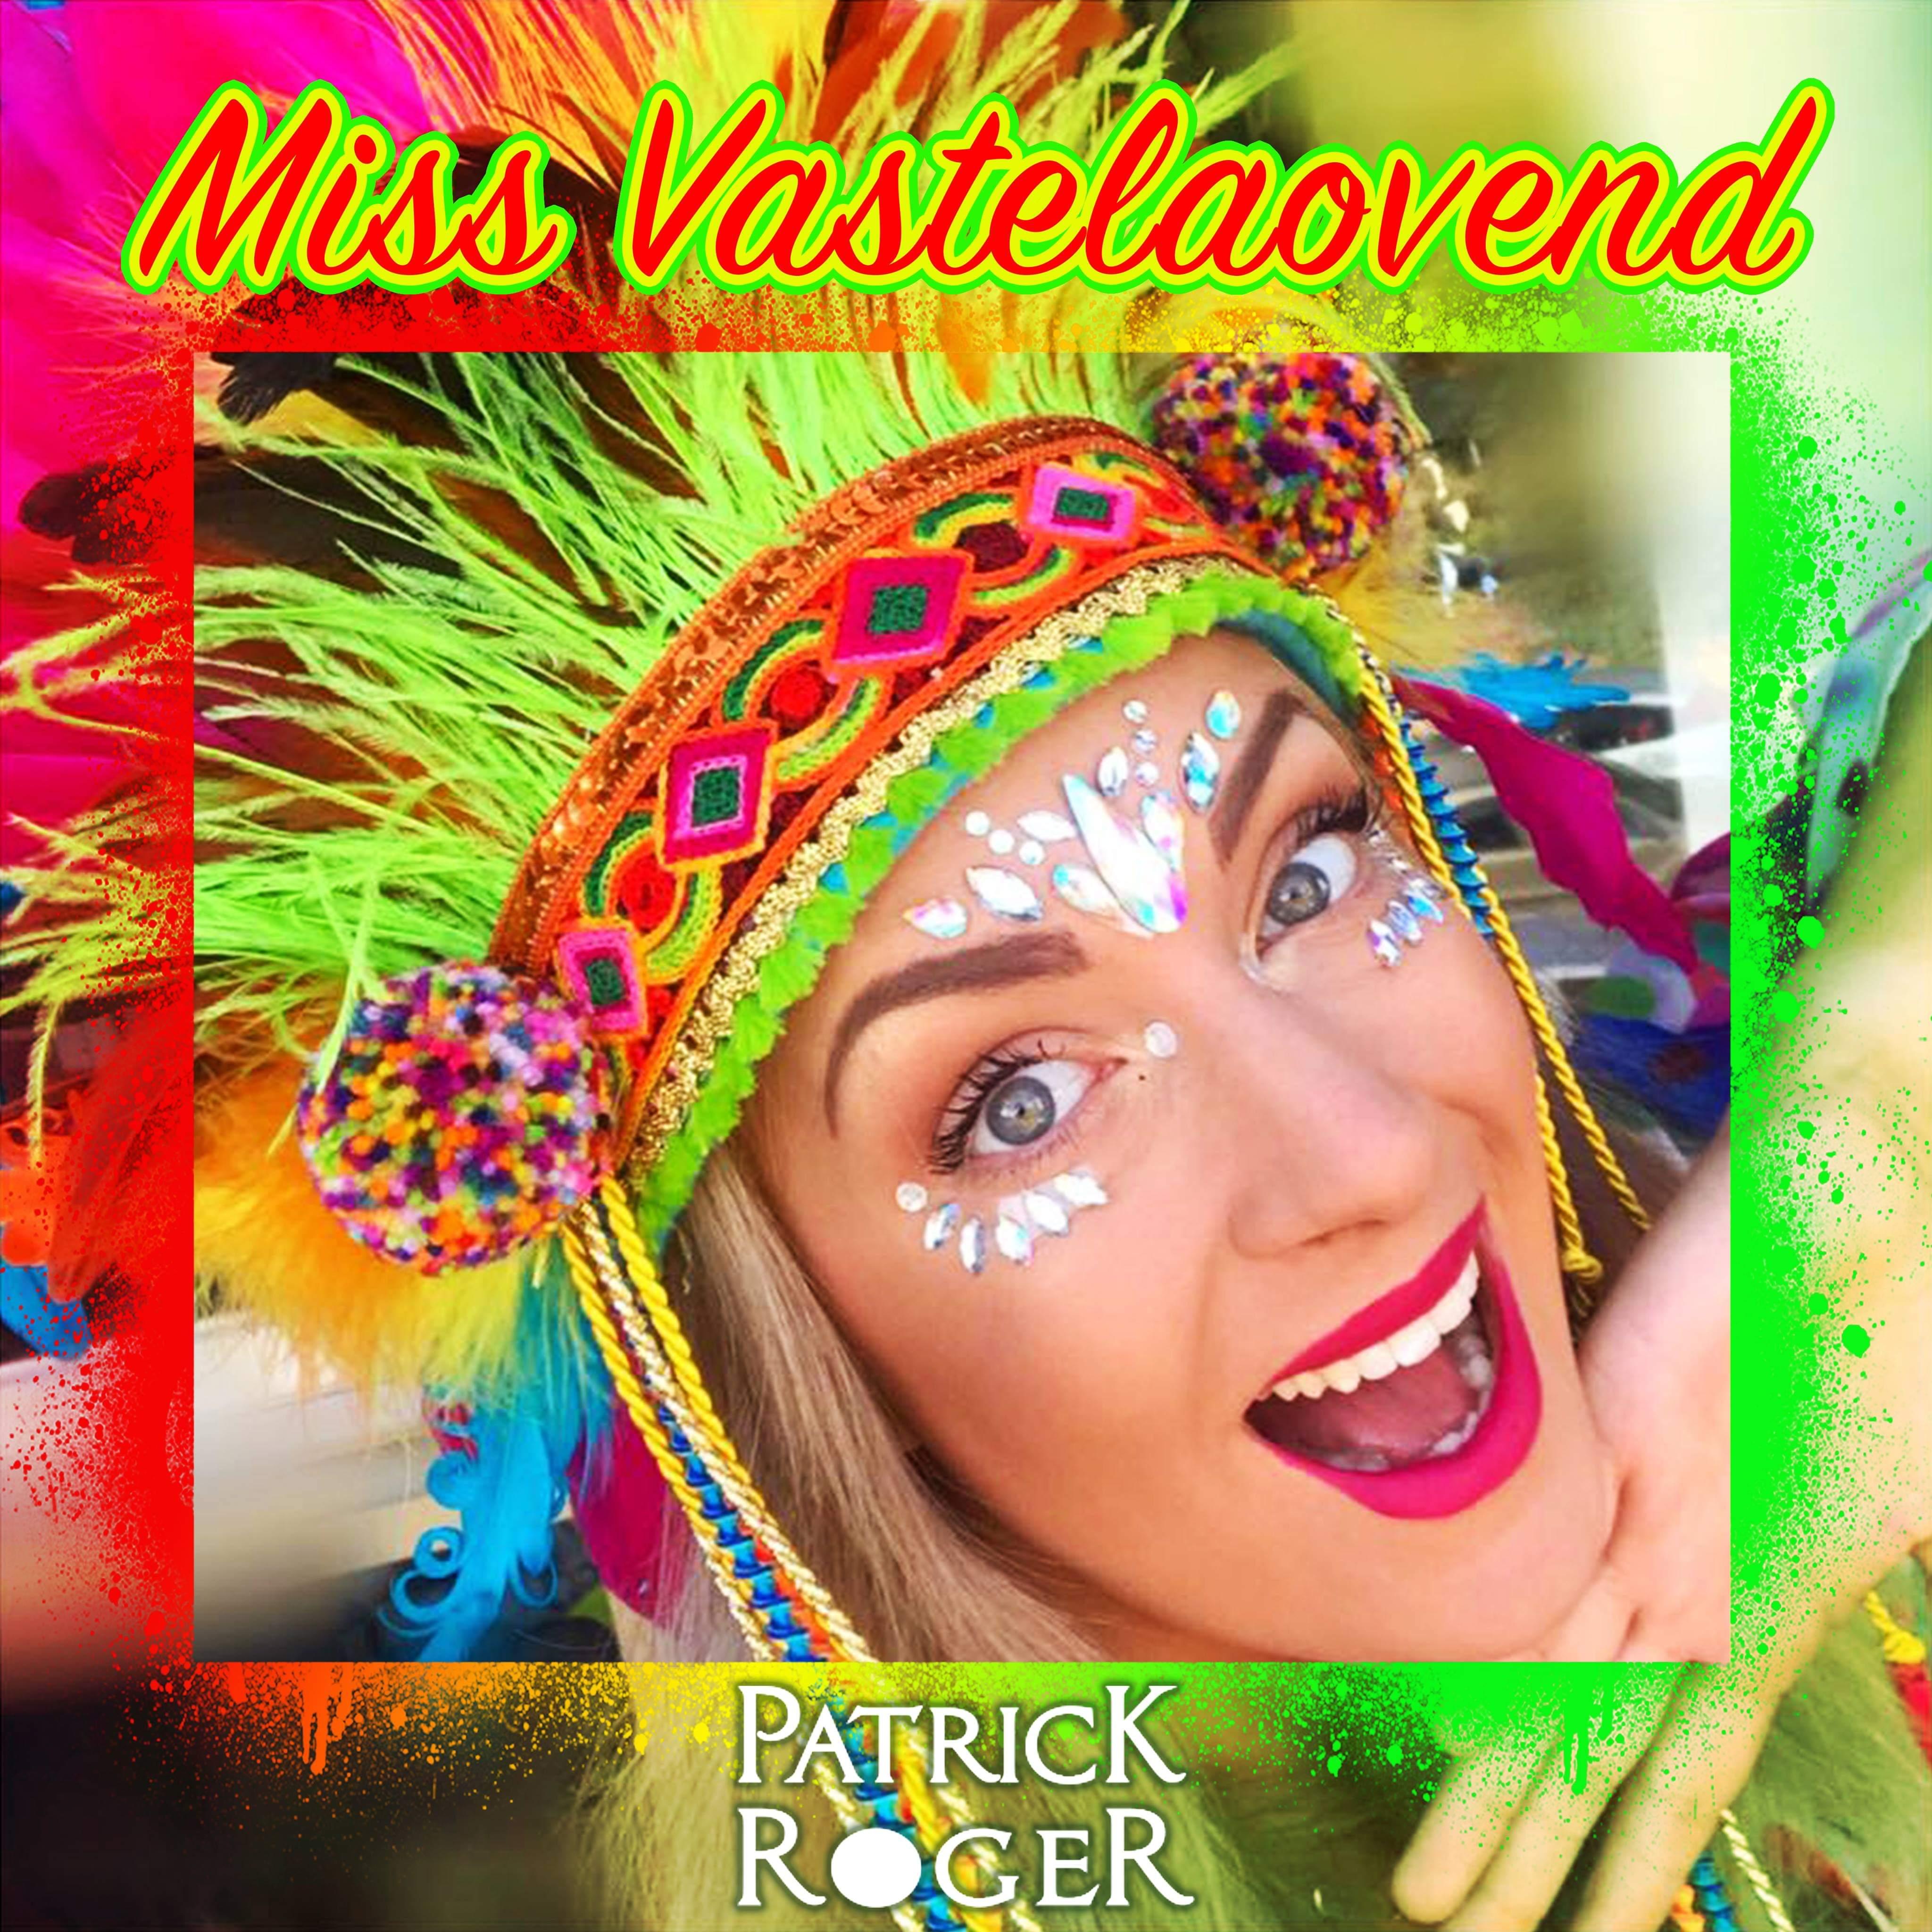 miss vastelaovend 2019.png